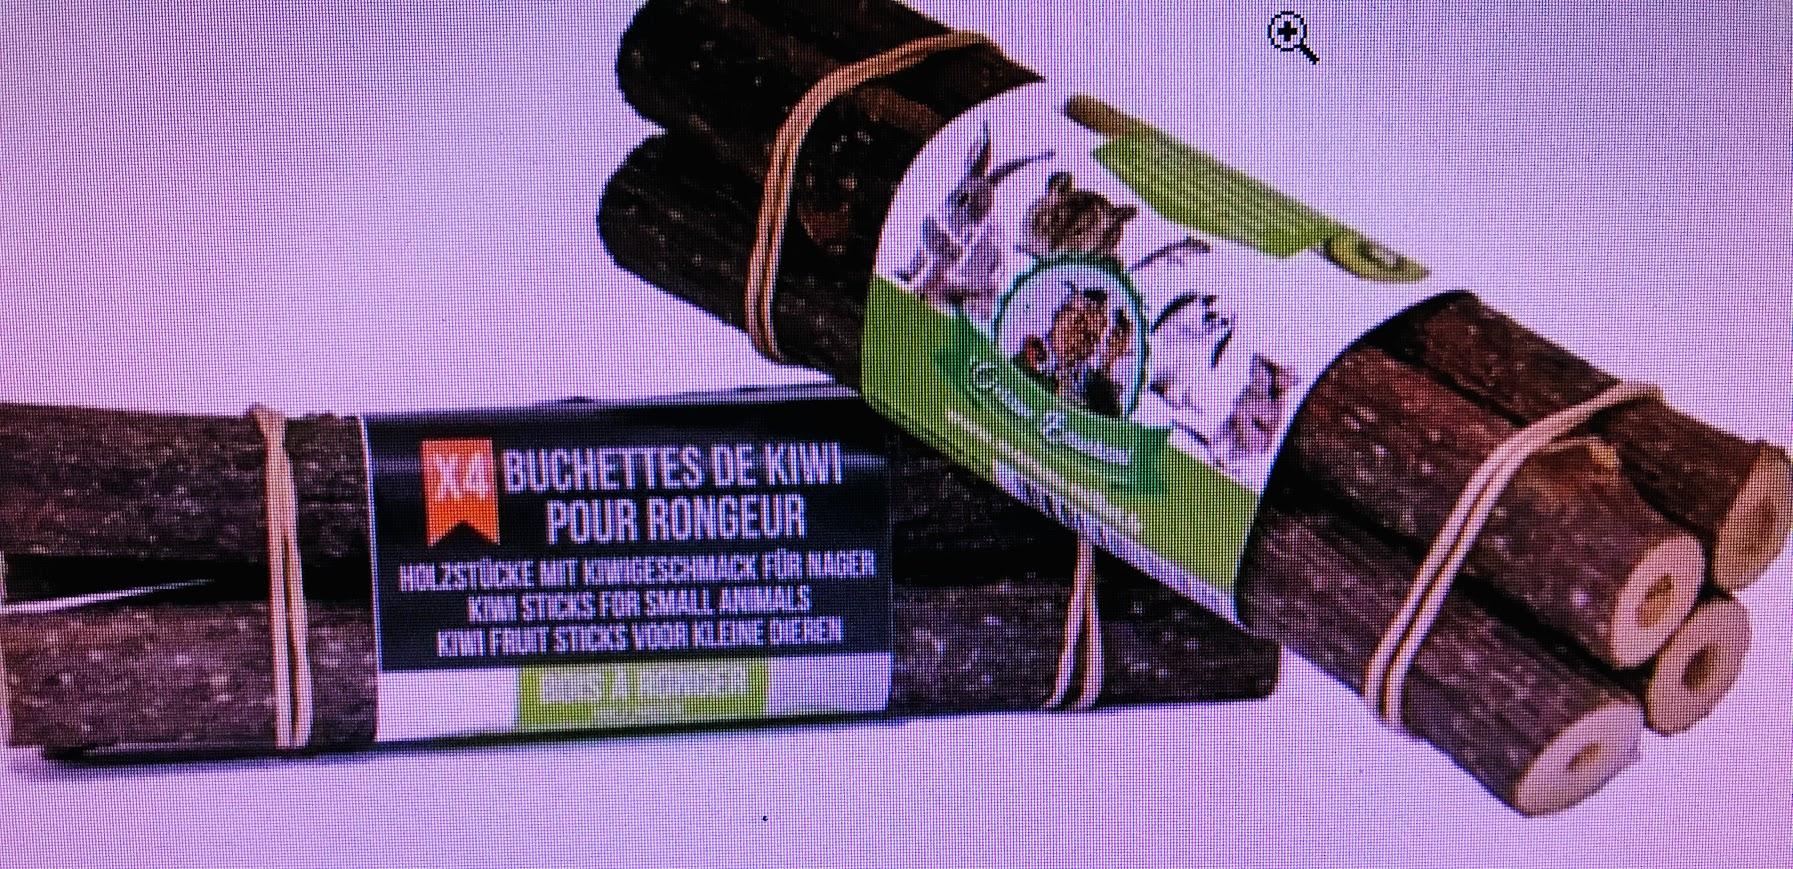 Buchettes kiwi x4